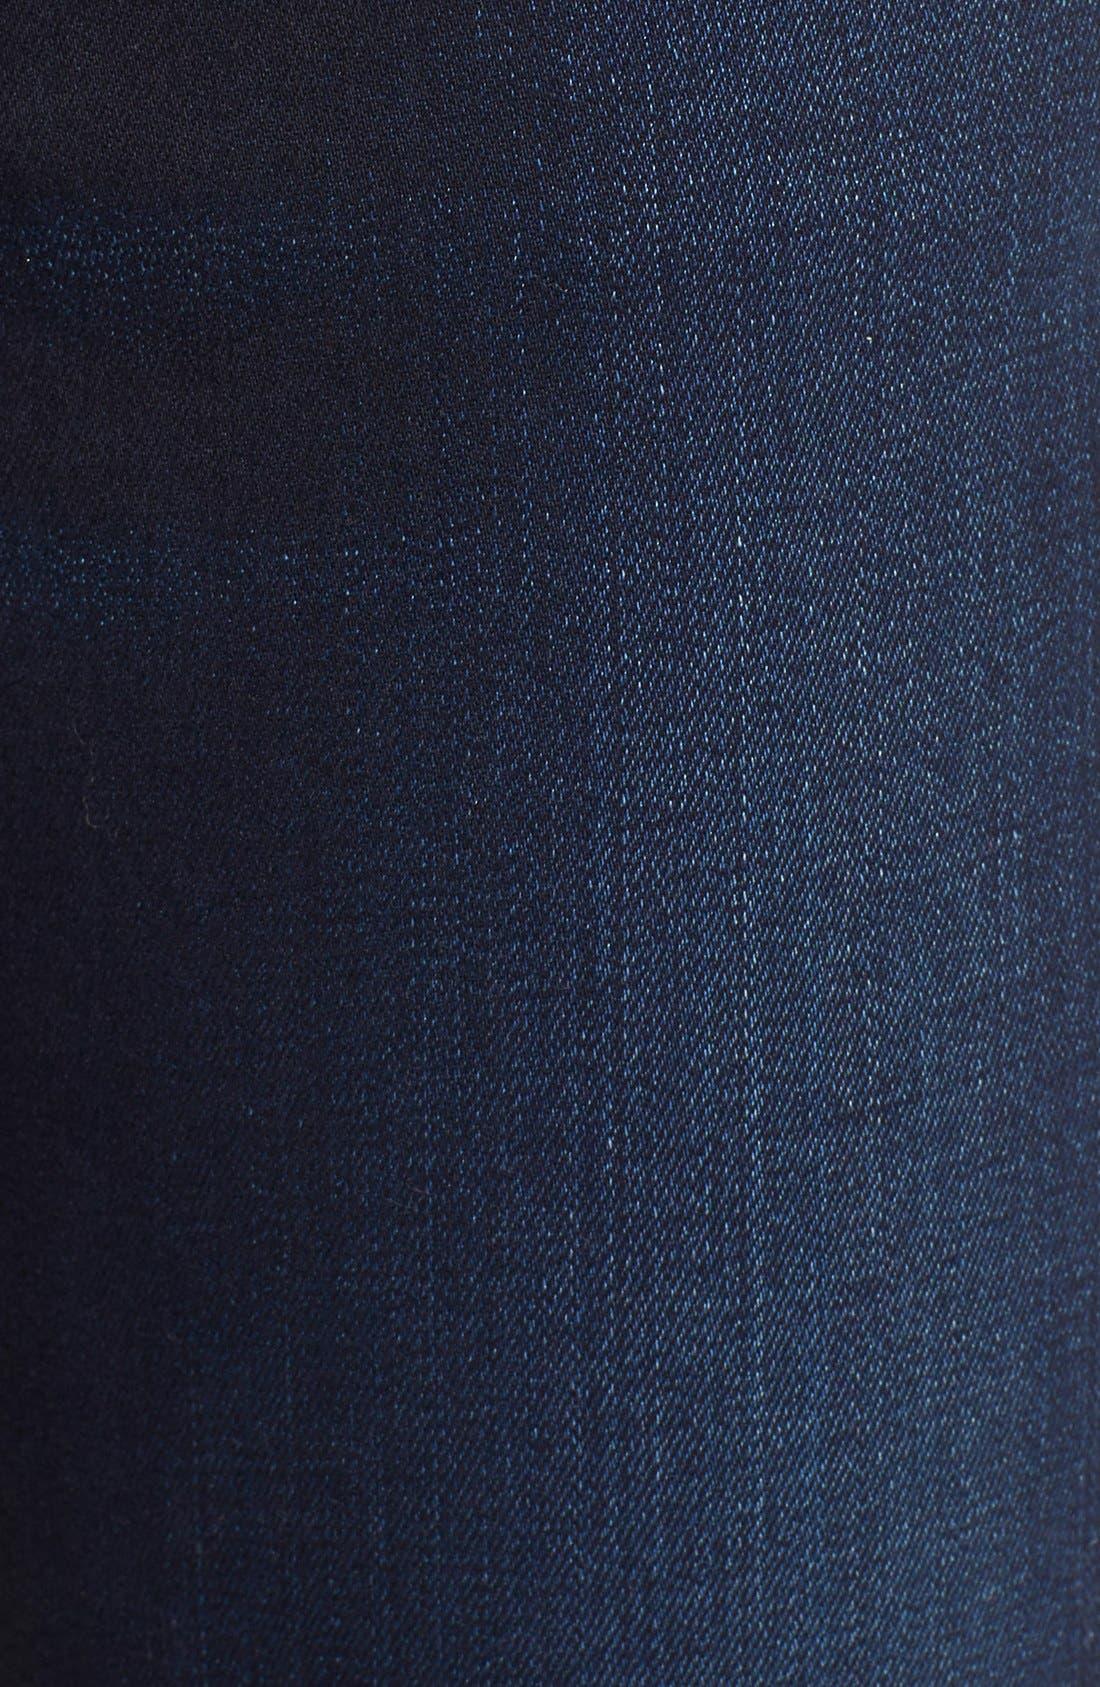 Love Bootcut Jeans,                             Alternate thumbnail 4, color,                             401